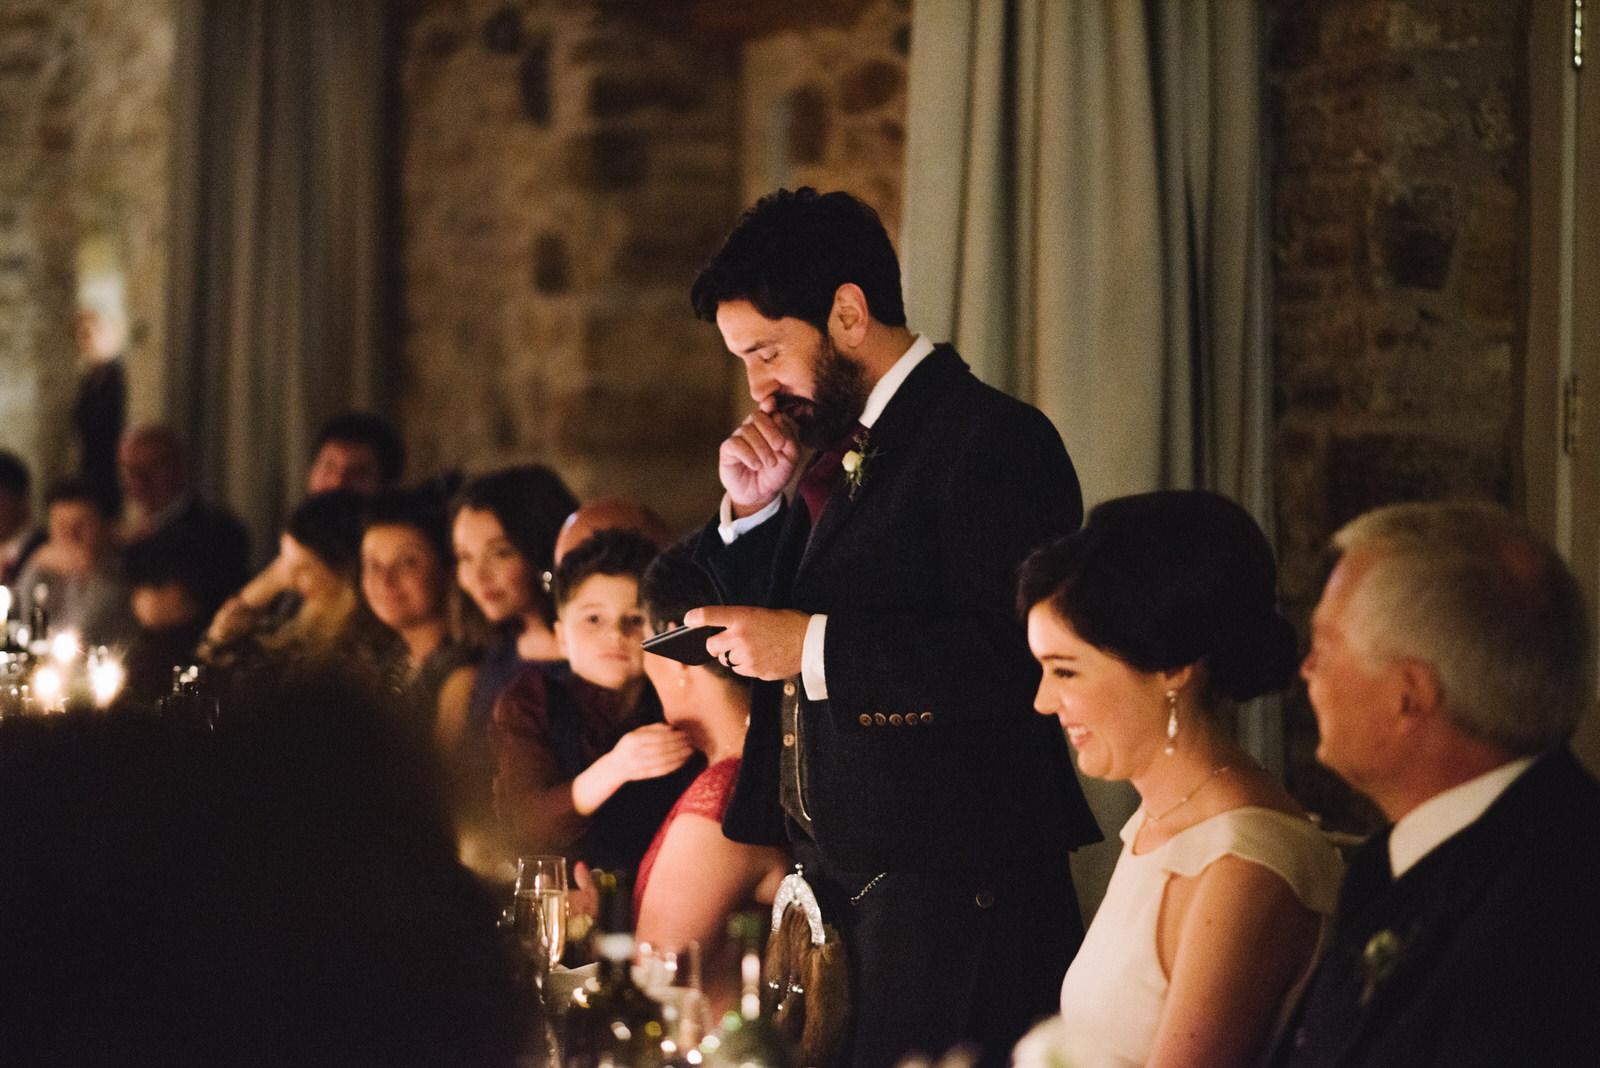 036-COLSTOUN-HOUSE-WEDDING-ALTERNATIVE-WEDDING-PHOTOGRAPHER-GLASGOW-WEDDING-PHOTOGRAPHER-STYLISH-SCOTTISH-WEDDING.JPG